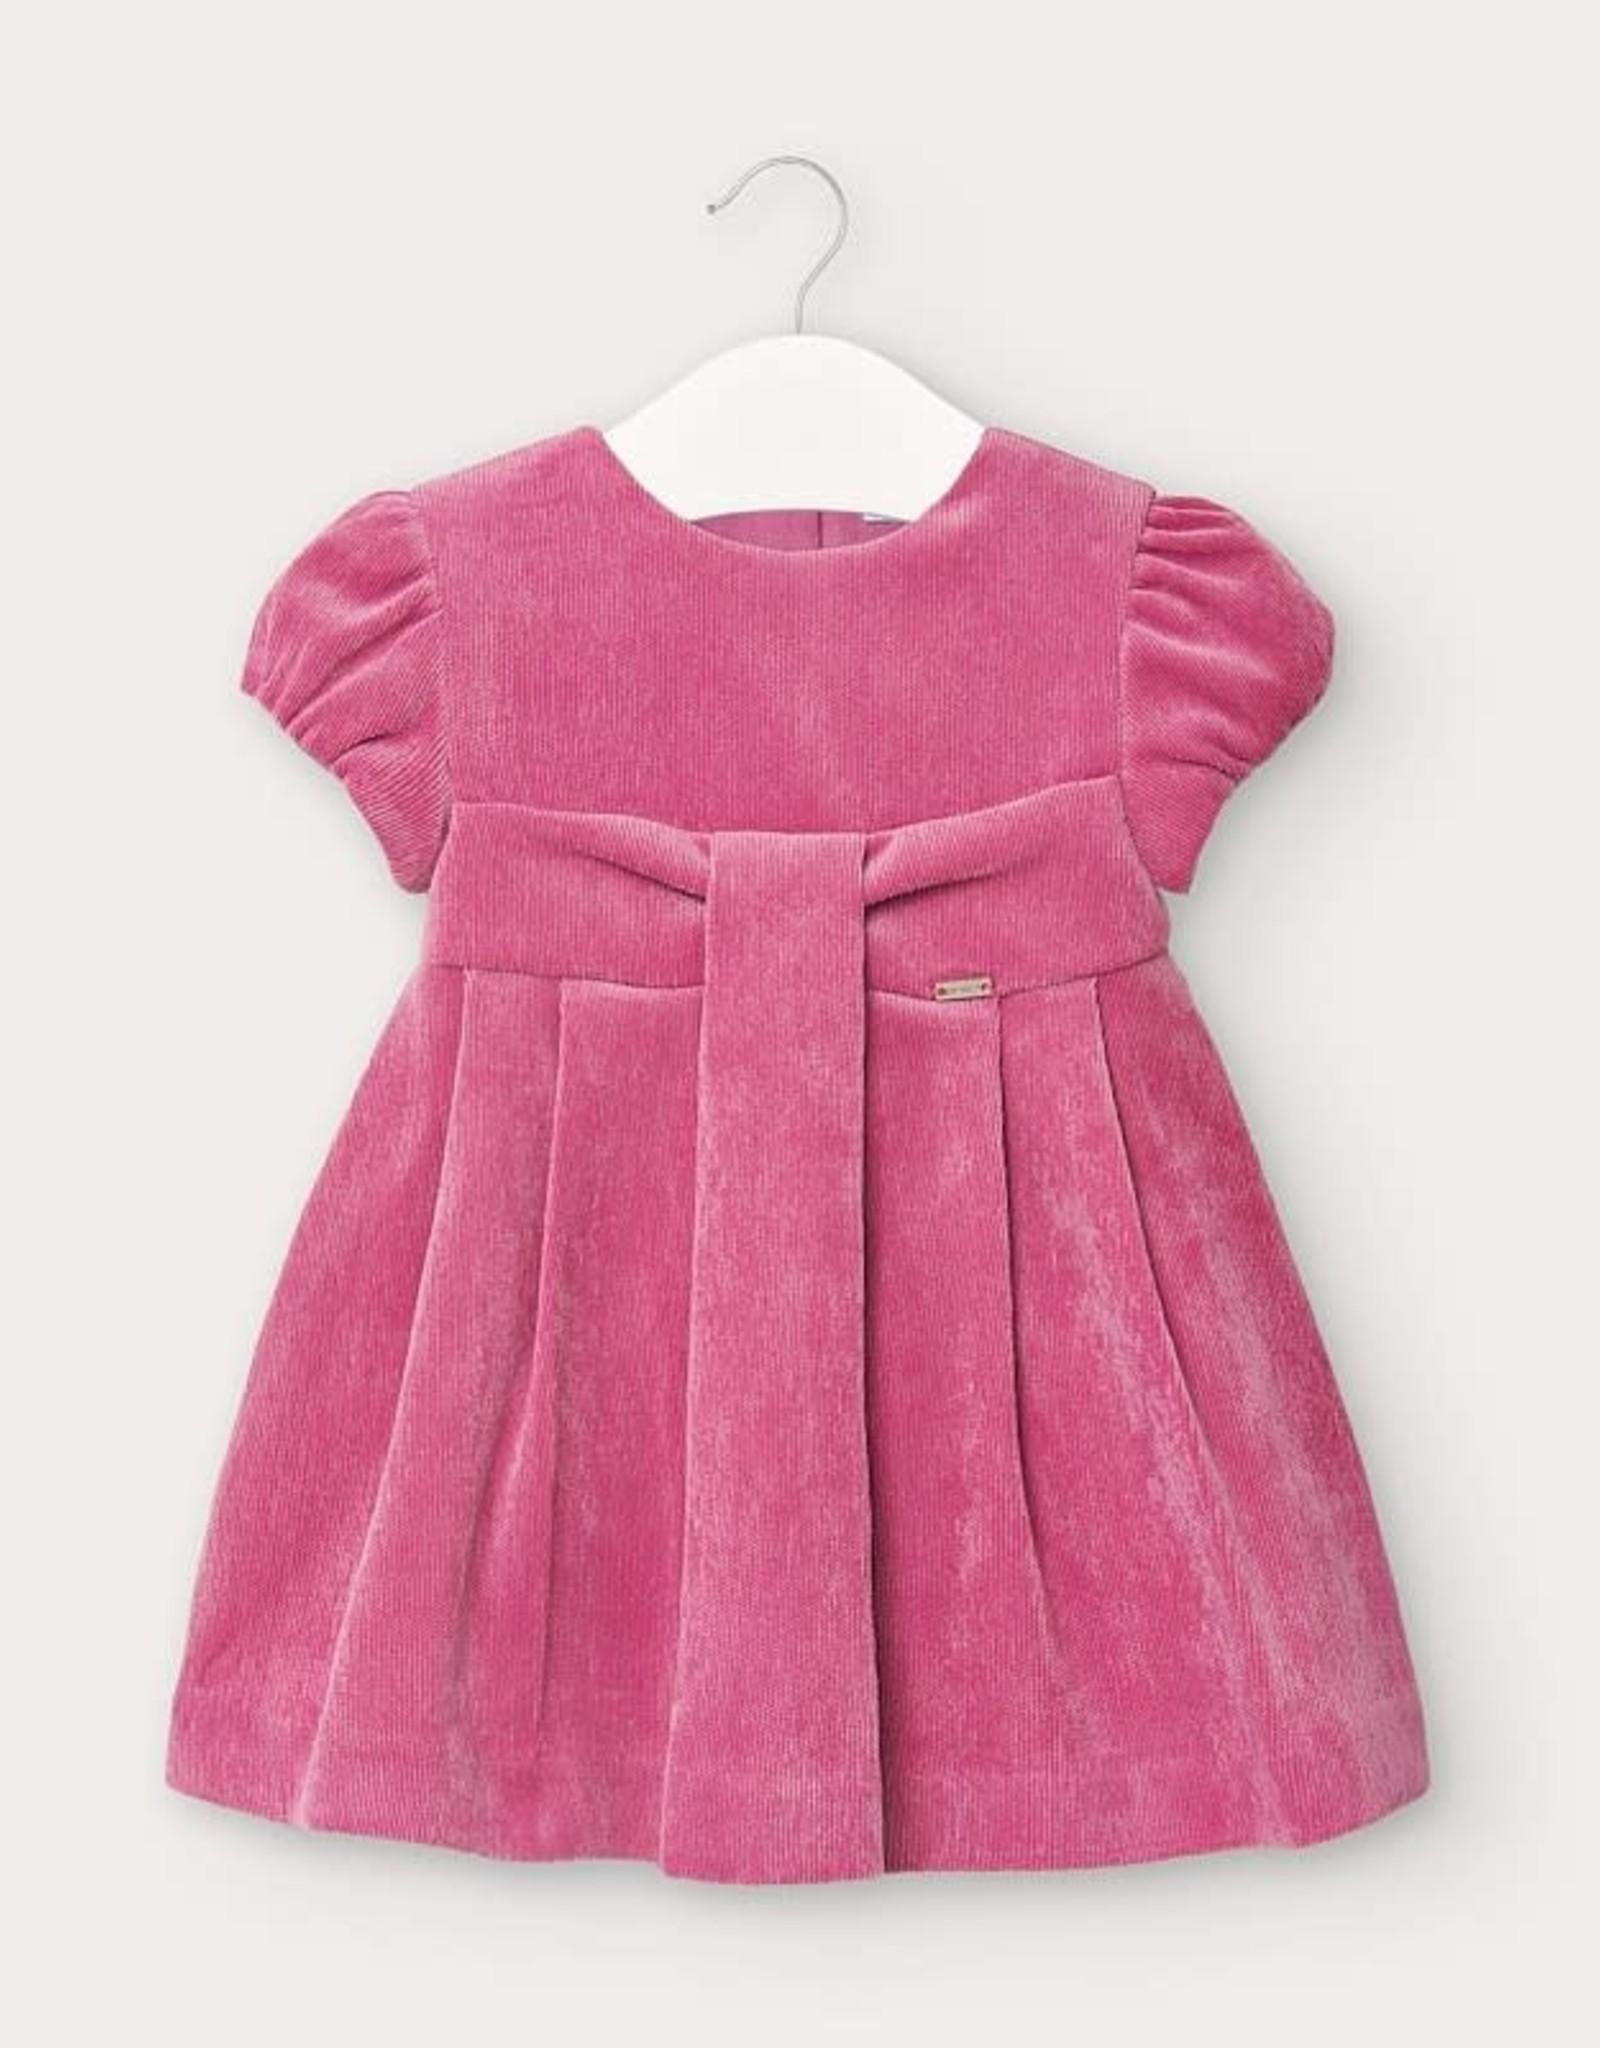 Mayoral Mayoral Baby Girl Corduroy Dress